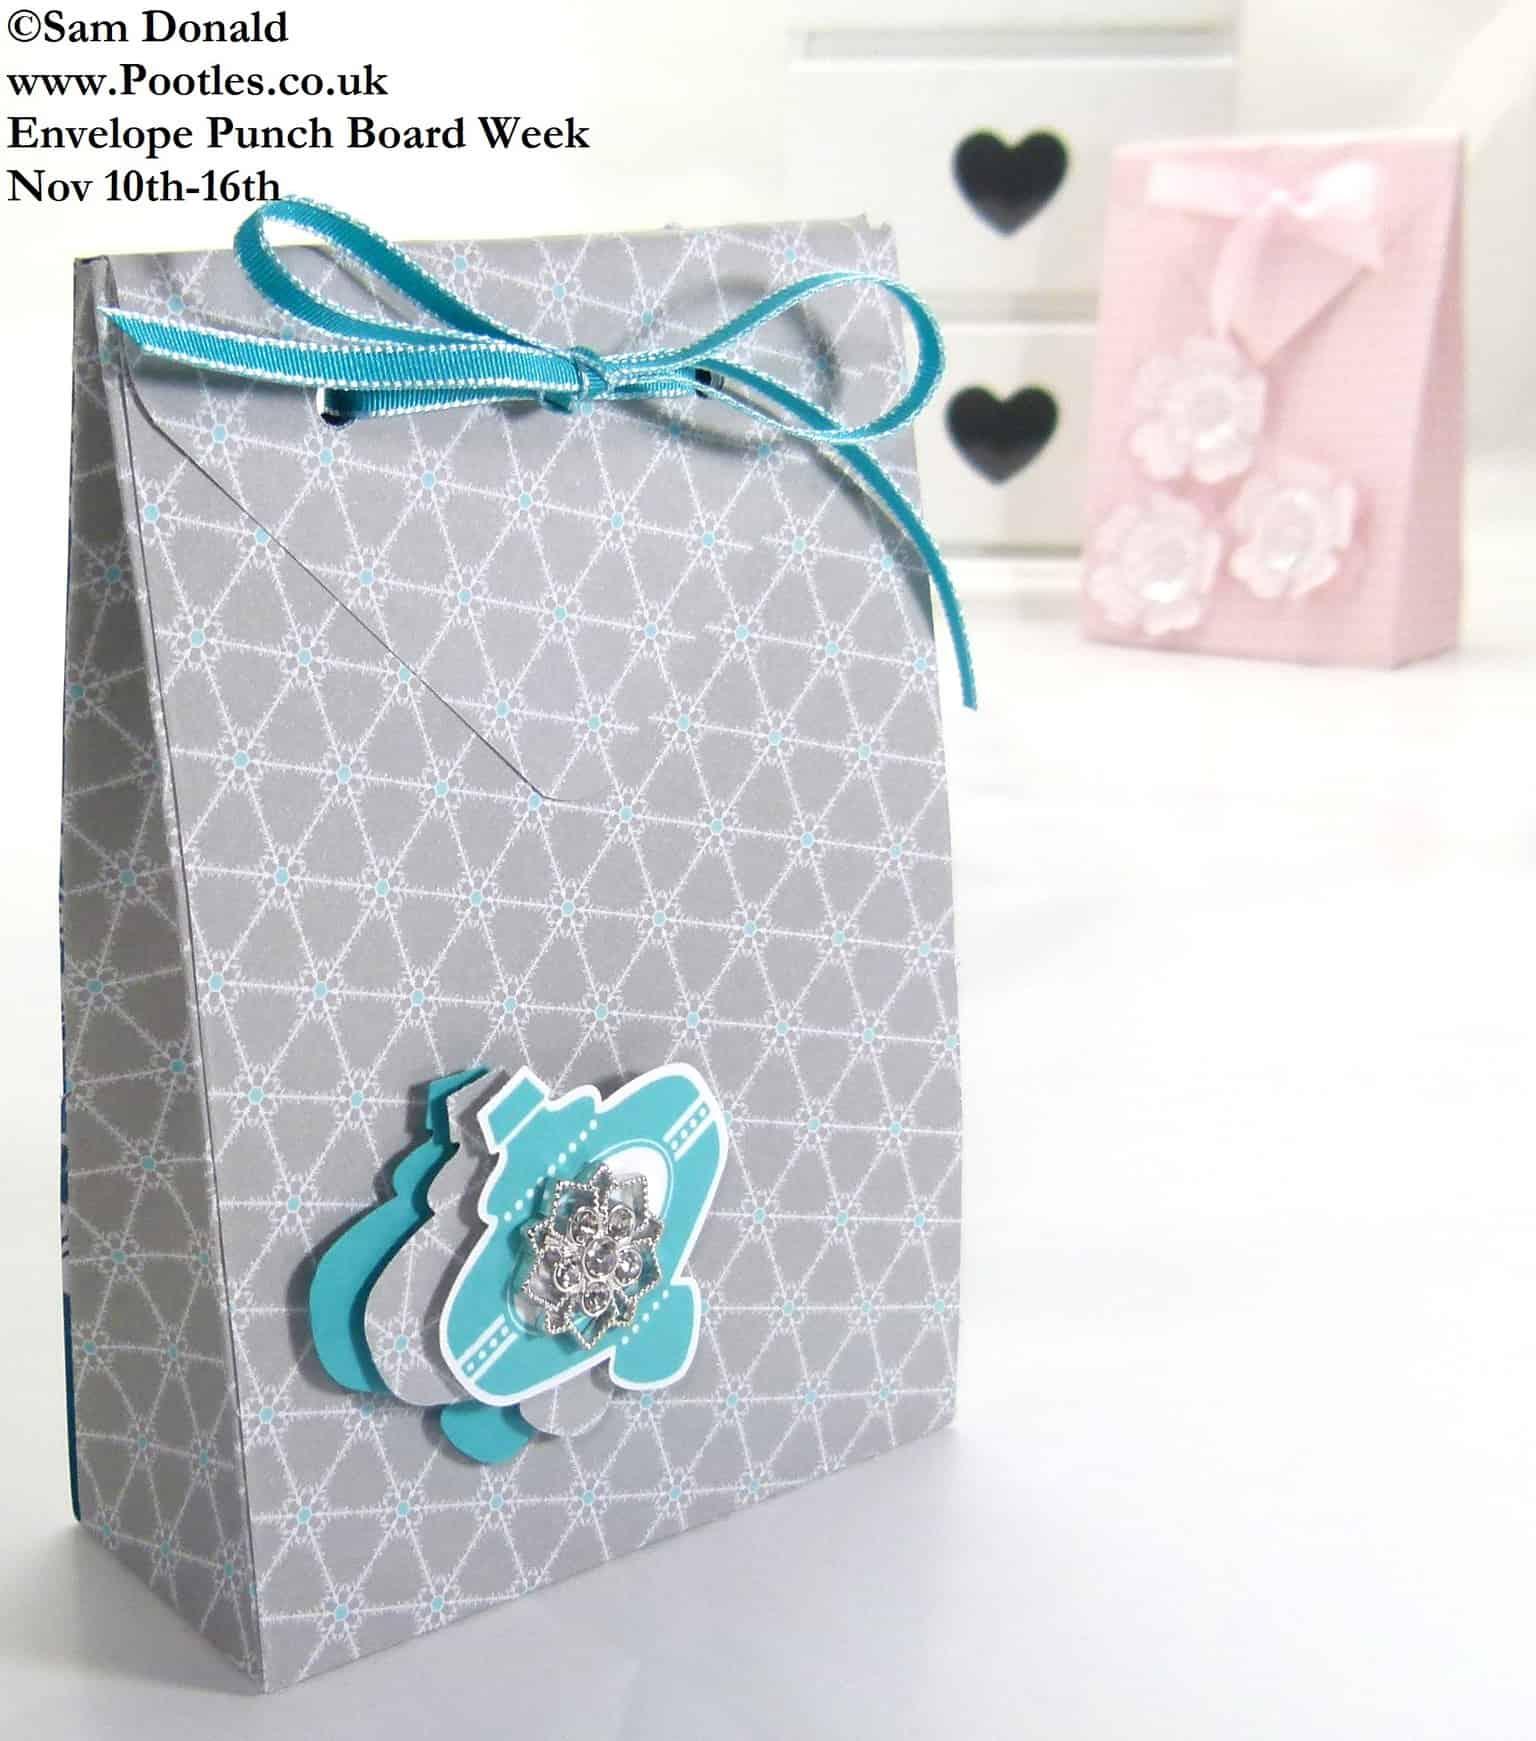 POOTLES Stampin Up ENVELOPE PUNCH BOARD WEEK The Folded Gift Bag  4